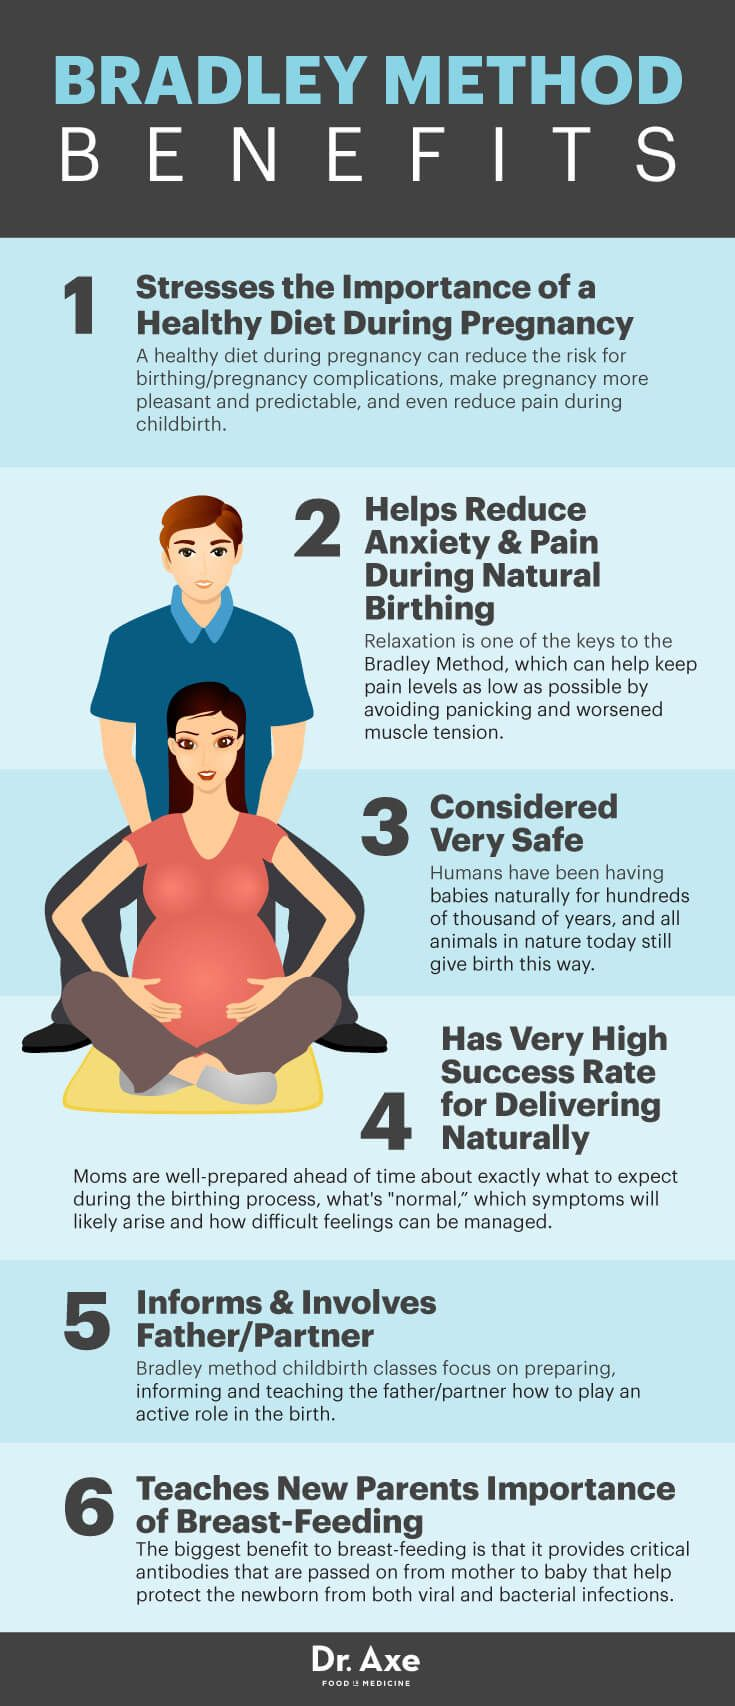 Bradley Method benefits - Dr. Axe http://www.draxe.com #health #holistic #natural